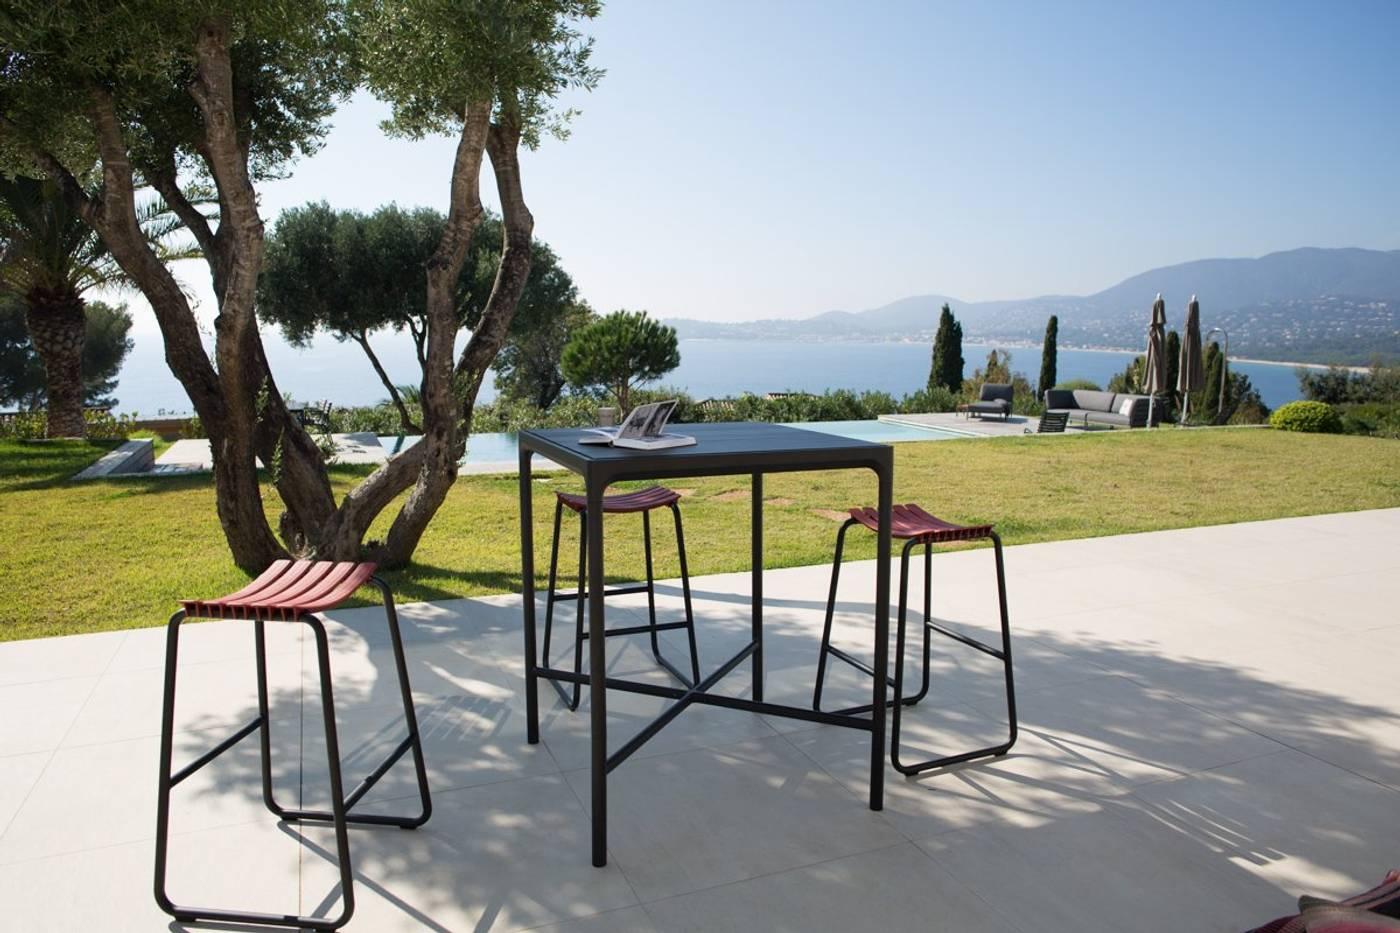 Four Table - Black Top & Frame 210cm